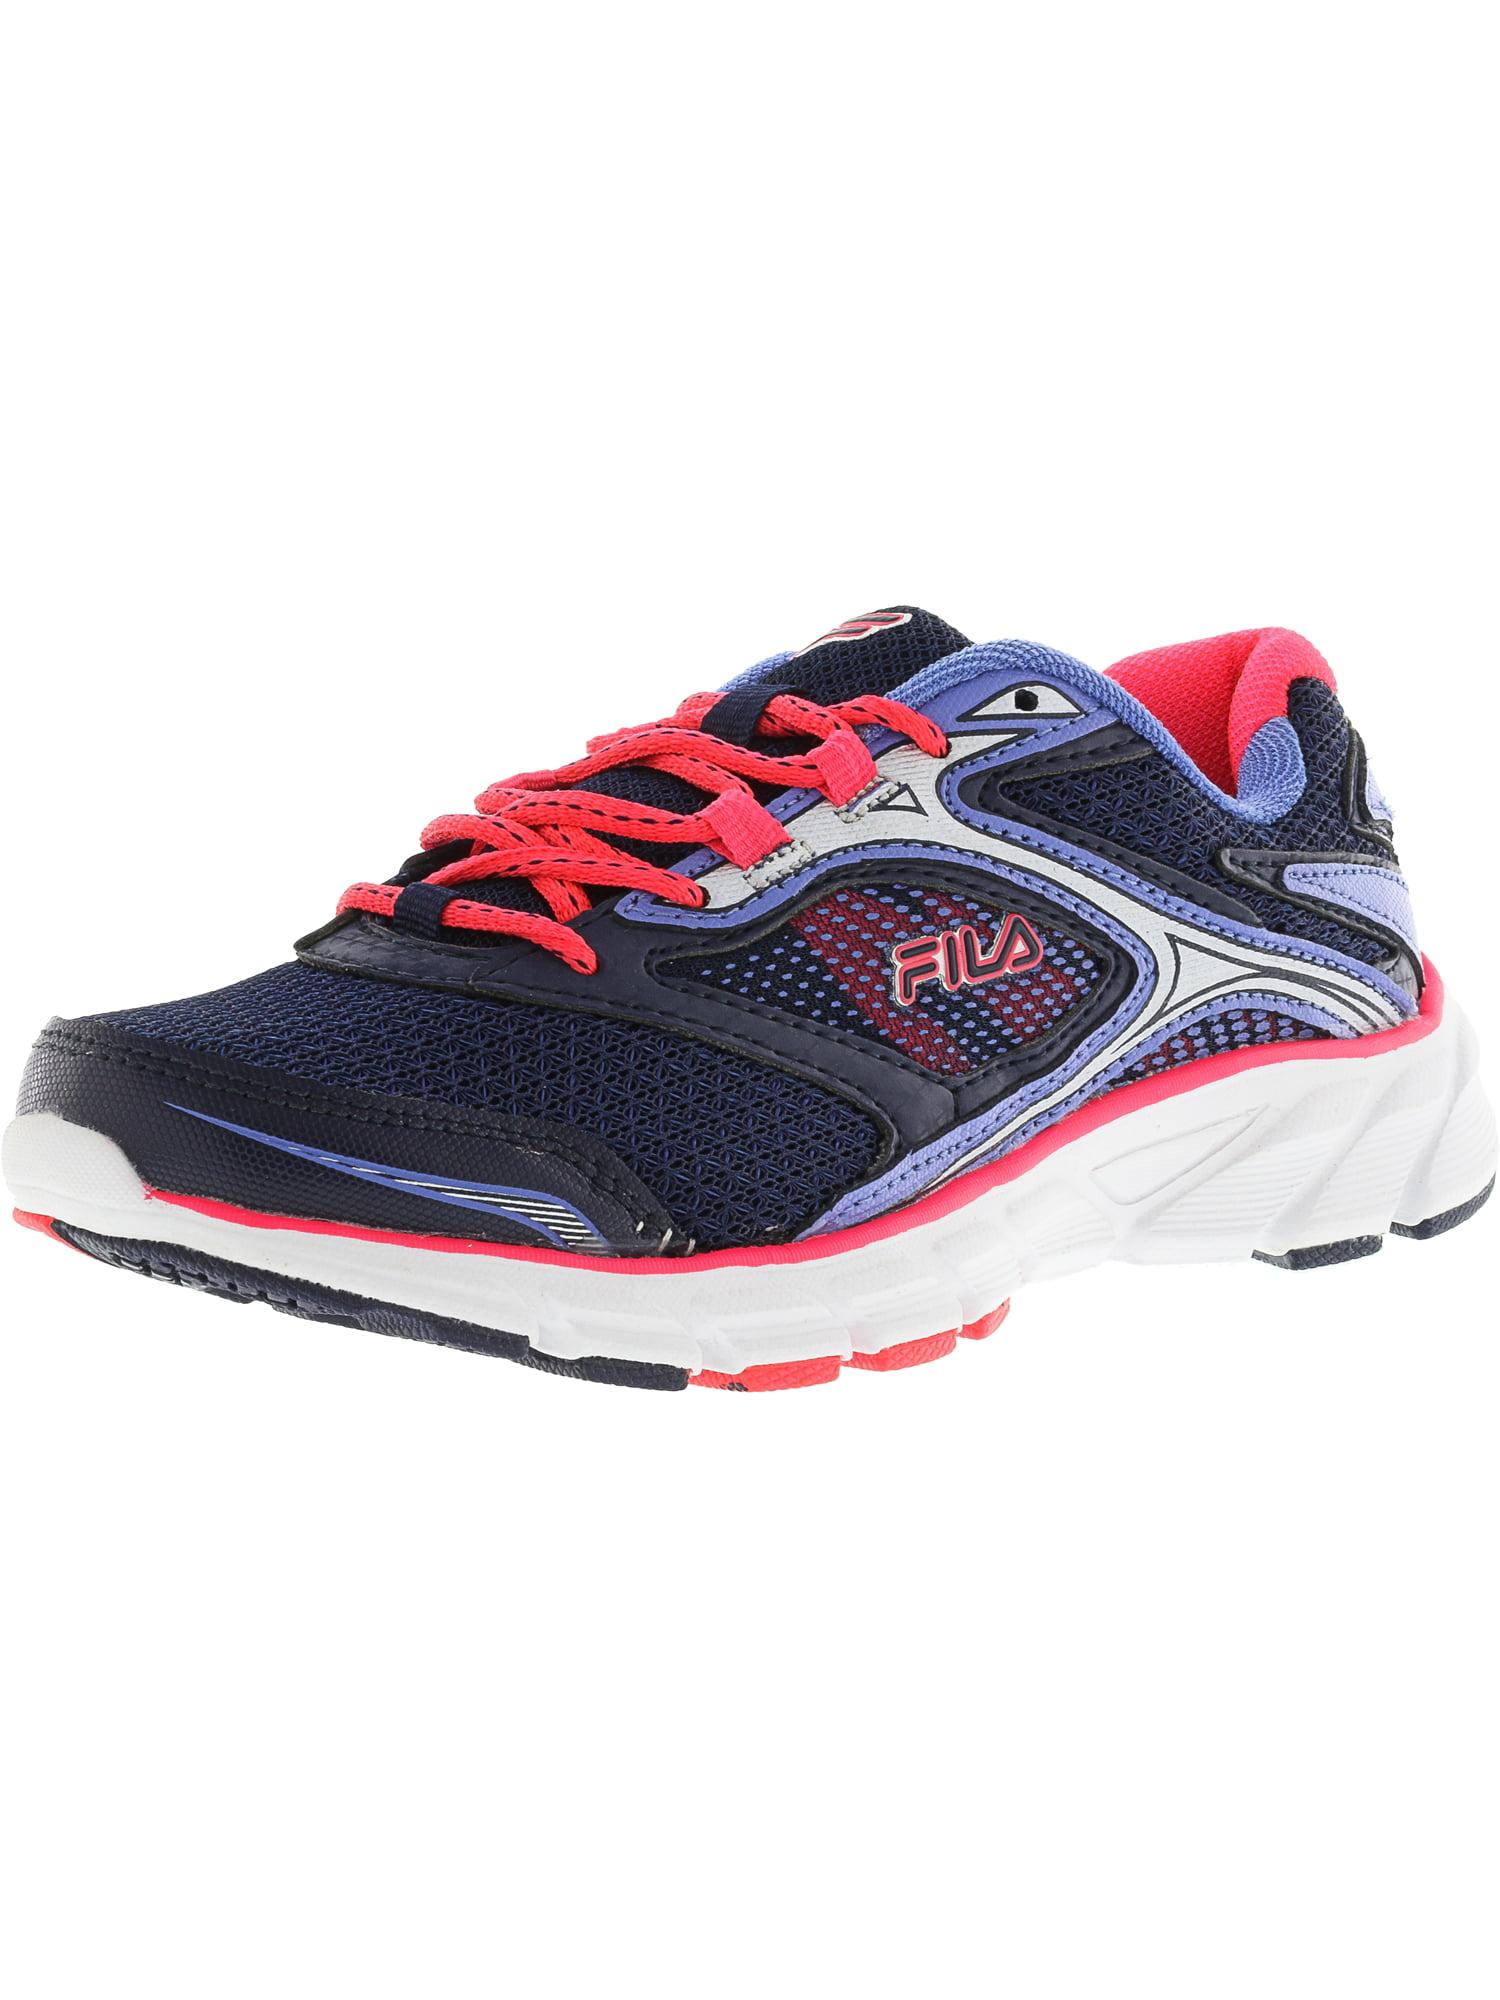 Fila Women's Stir Up Navy / Diva Pink Wedgewood Ankle-High Running Shoe - 8M